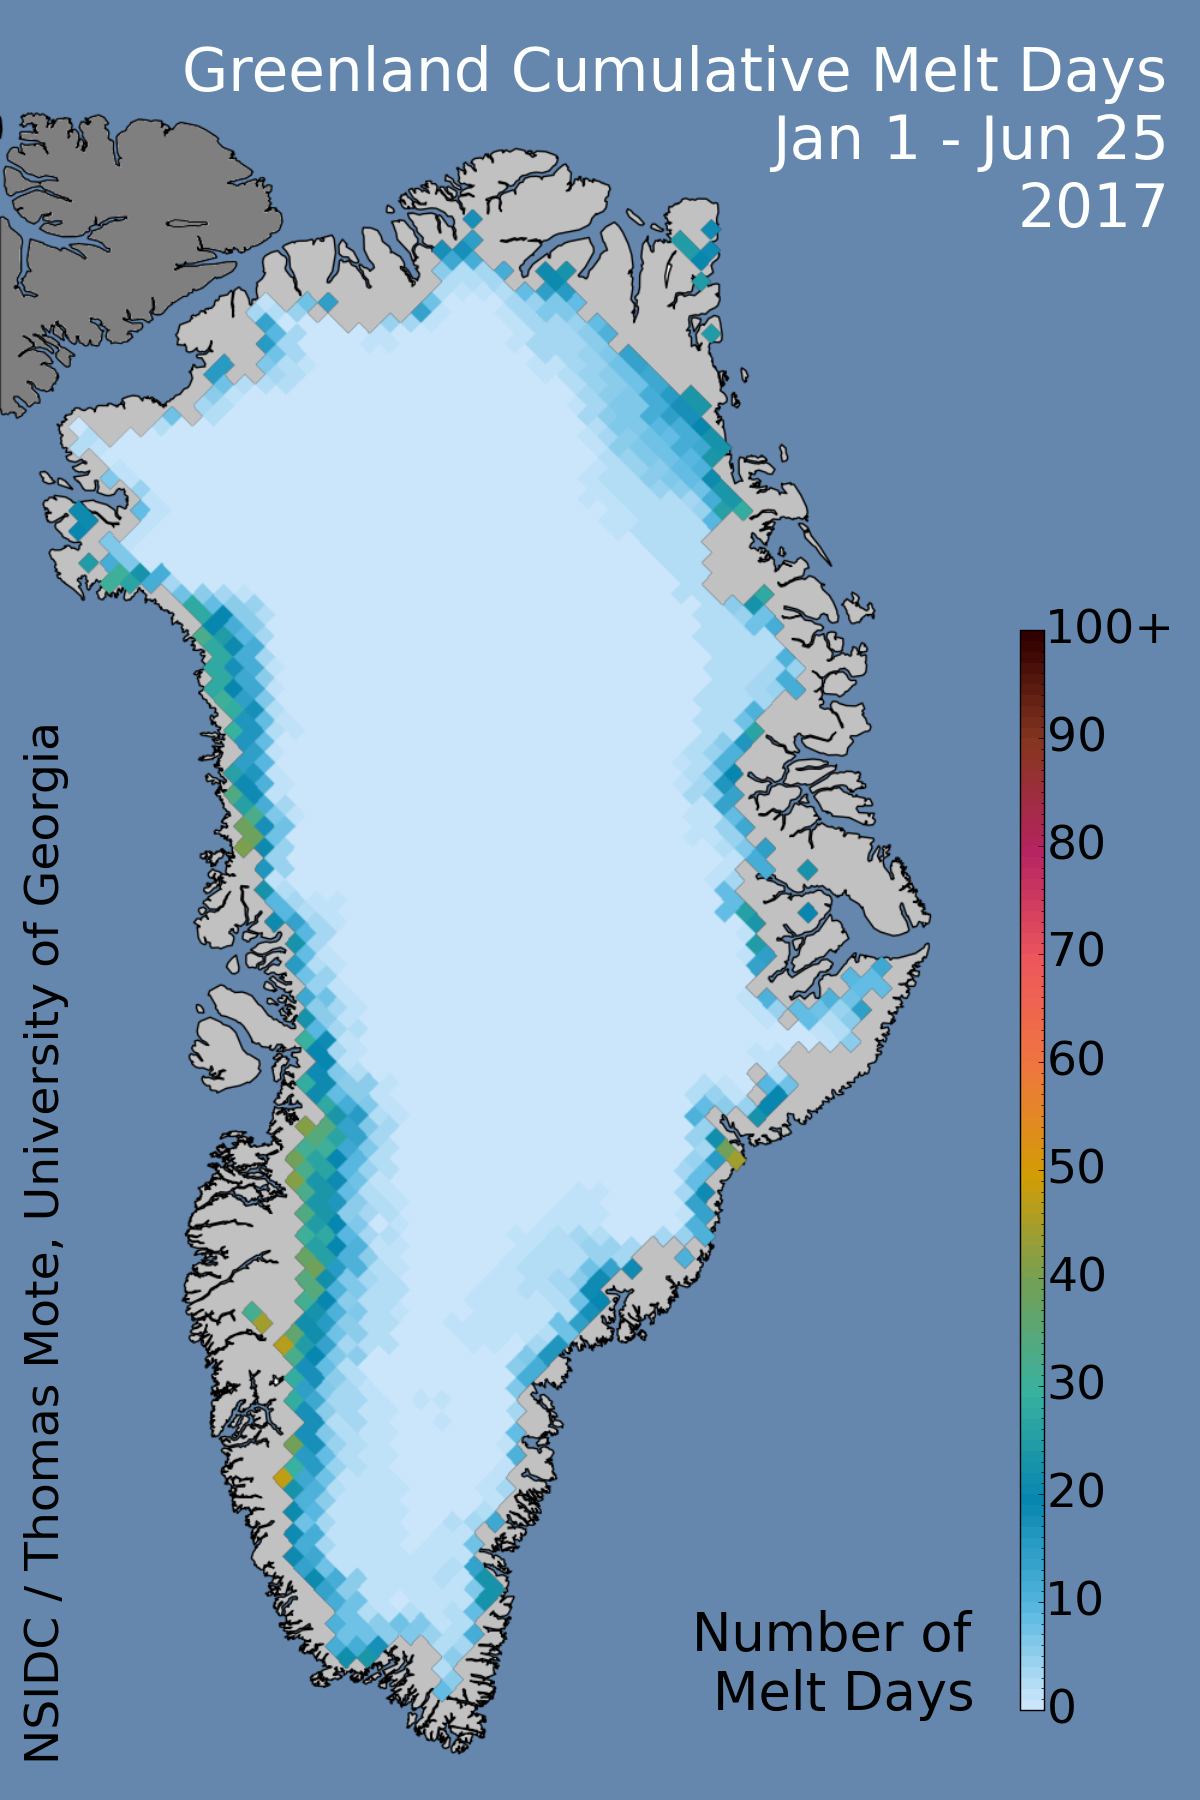 Groenlàndia Melt dies acumulatius a partir d'avui